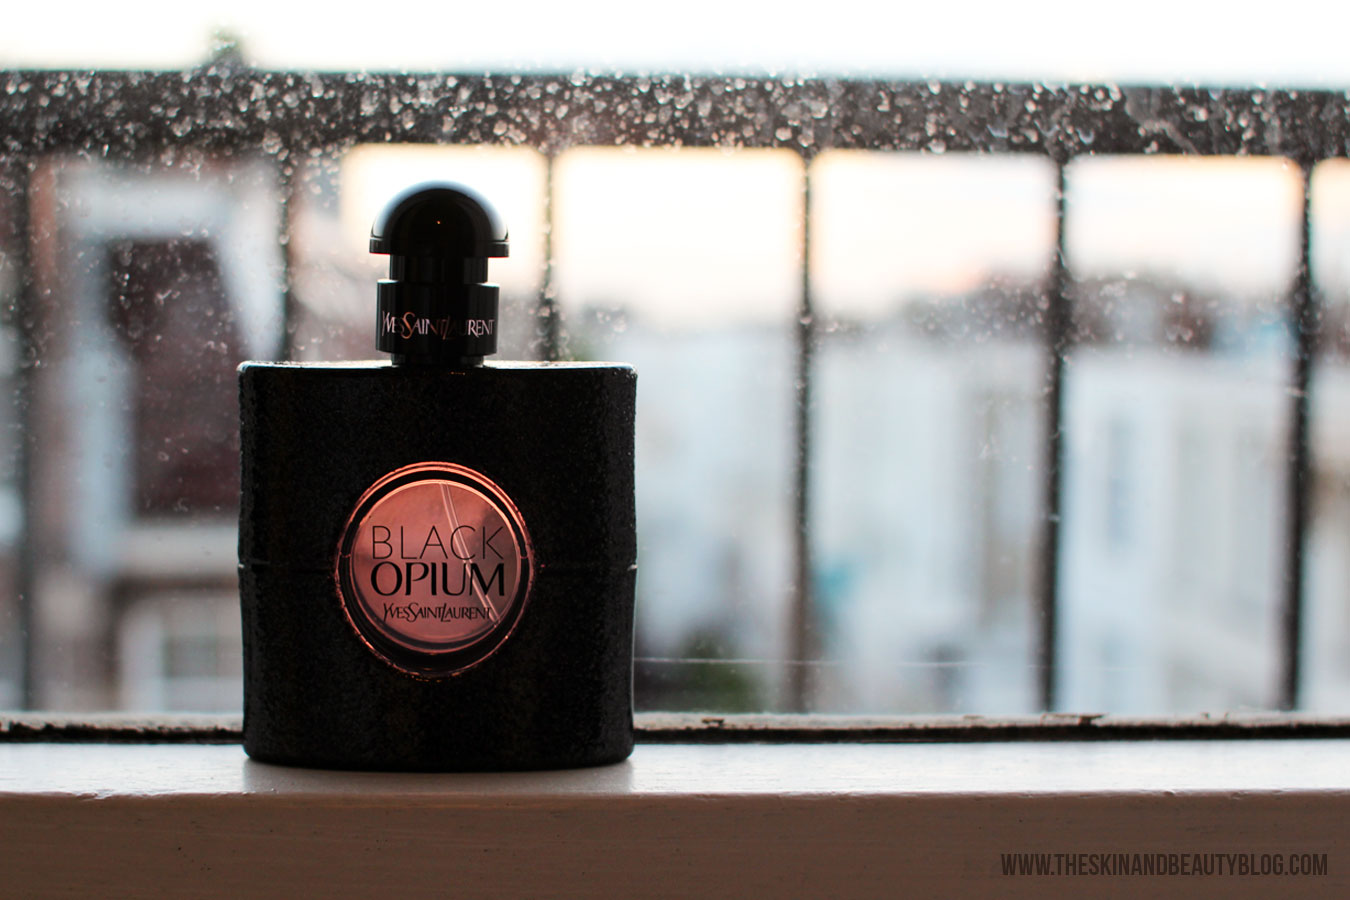 Opium Yves st Laurent Review Yves Saint Laurent Black Opium